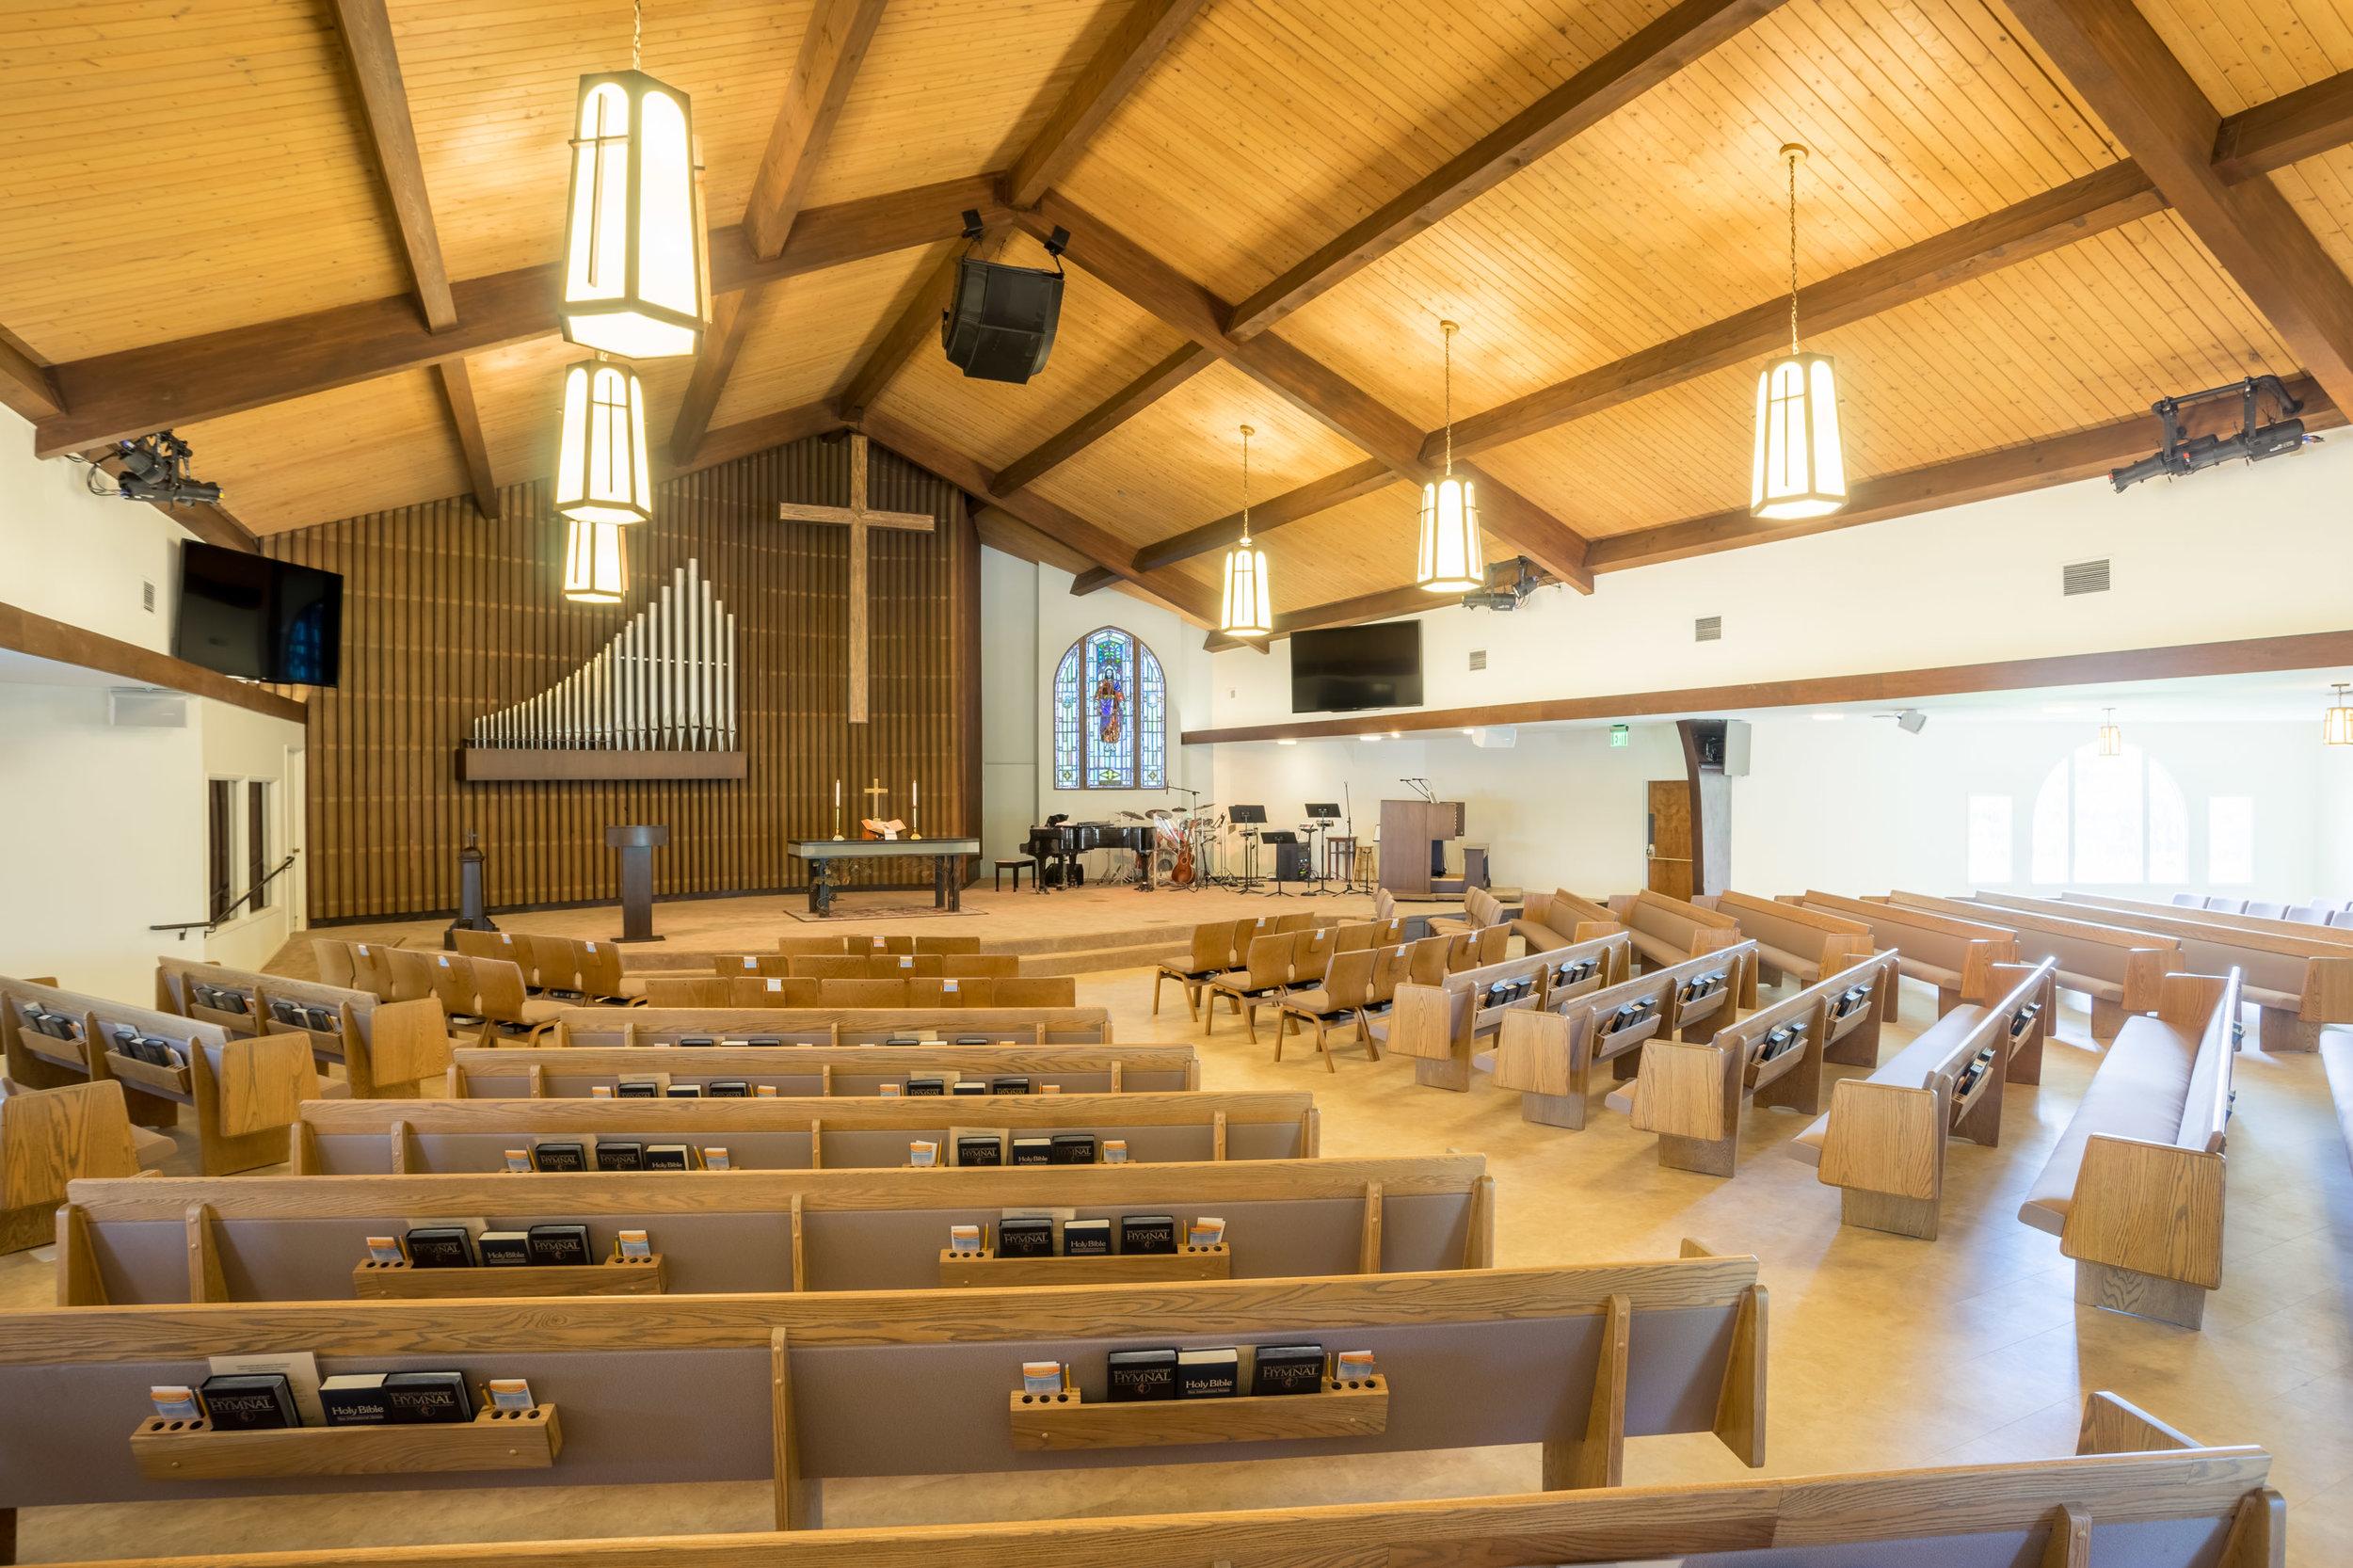 Yorba Linda church-1.jpg